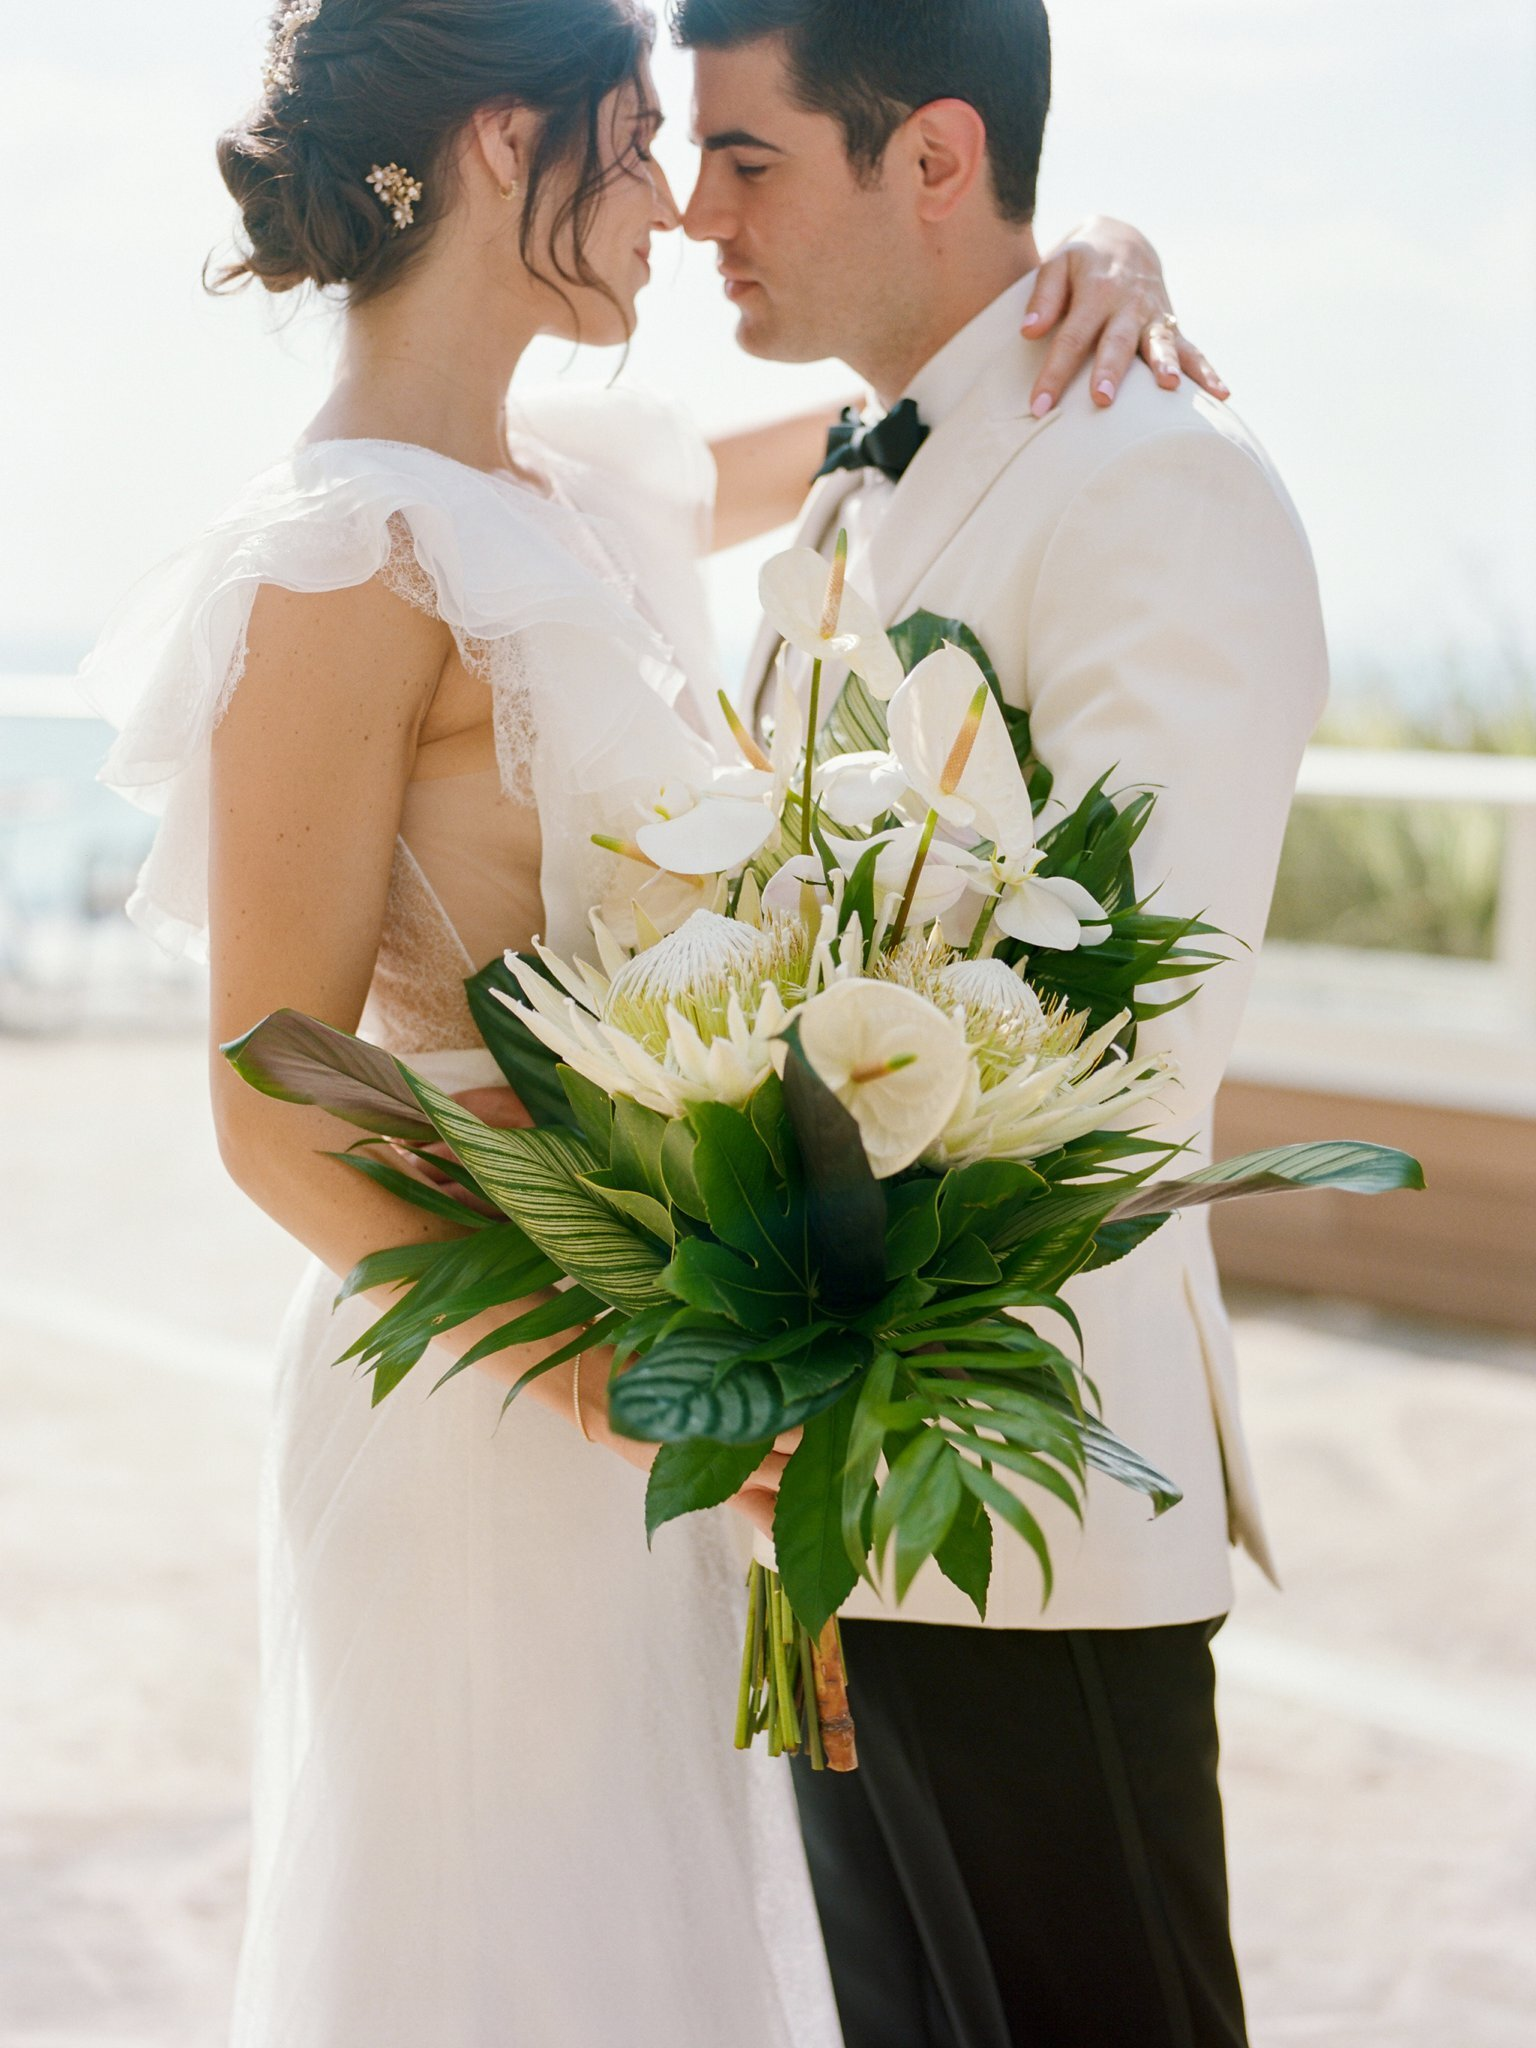 jw marriott marco island wedding photographer marco island wedding photographer shannon griffin photography_0201.jpg